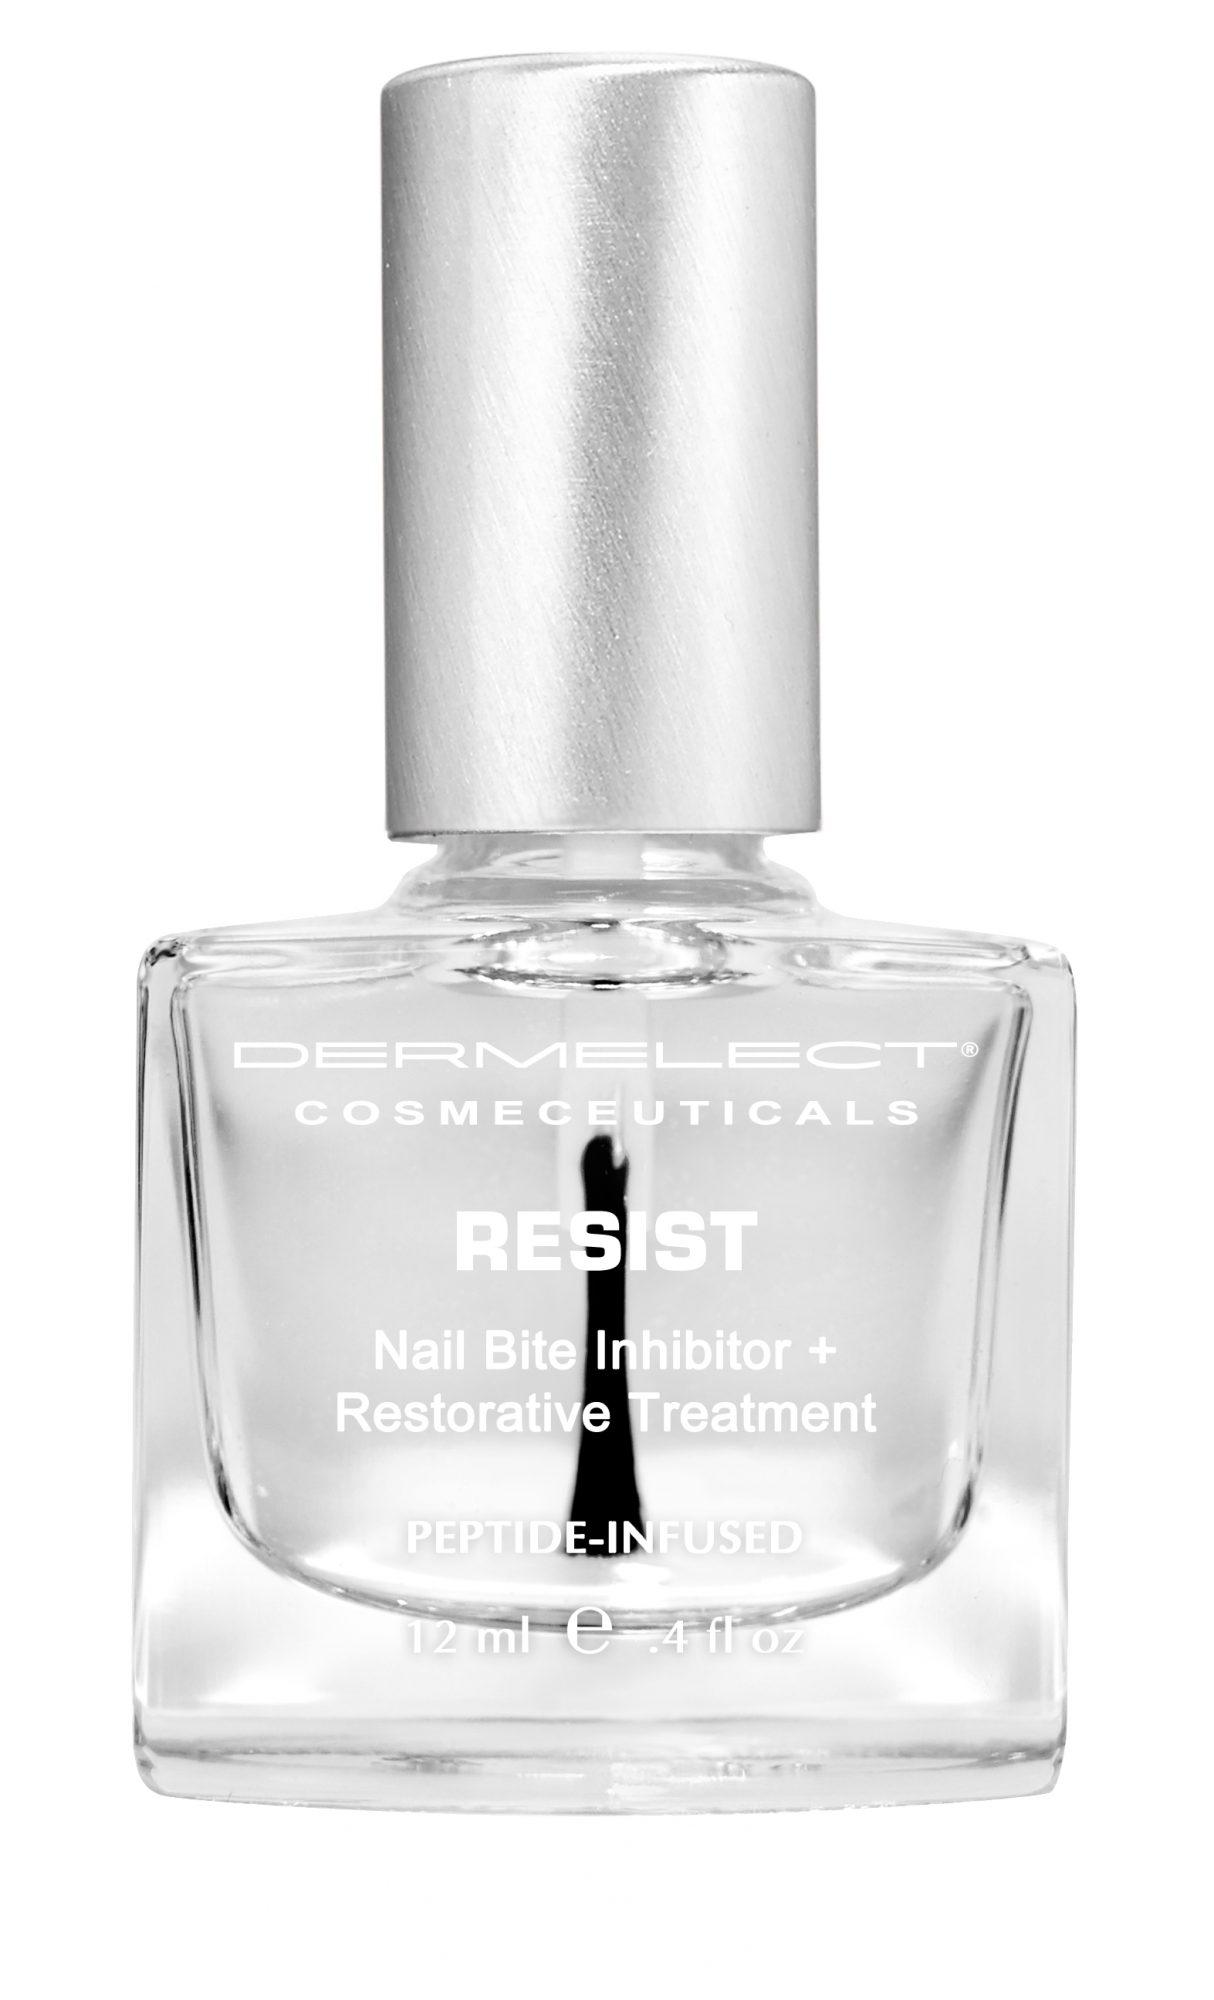 dermelect_resist-nail-bite-inhibitor.jpg